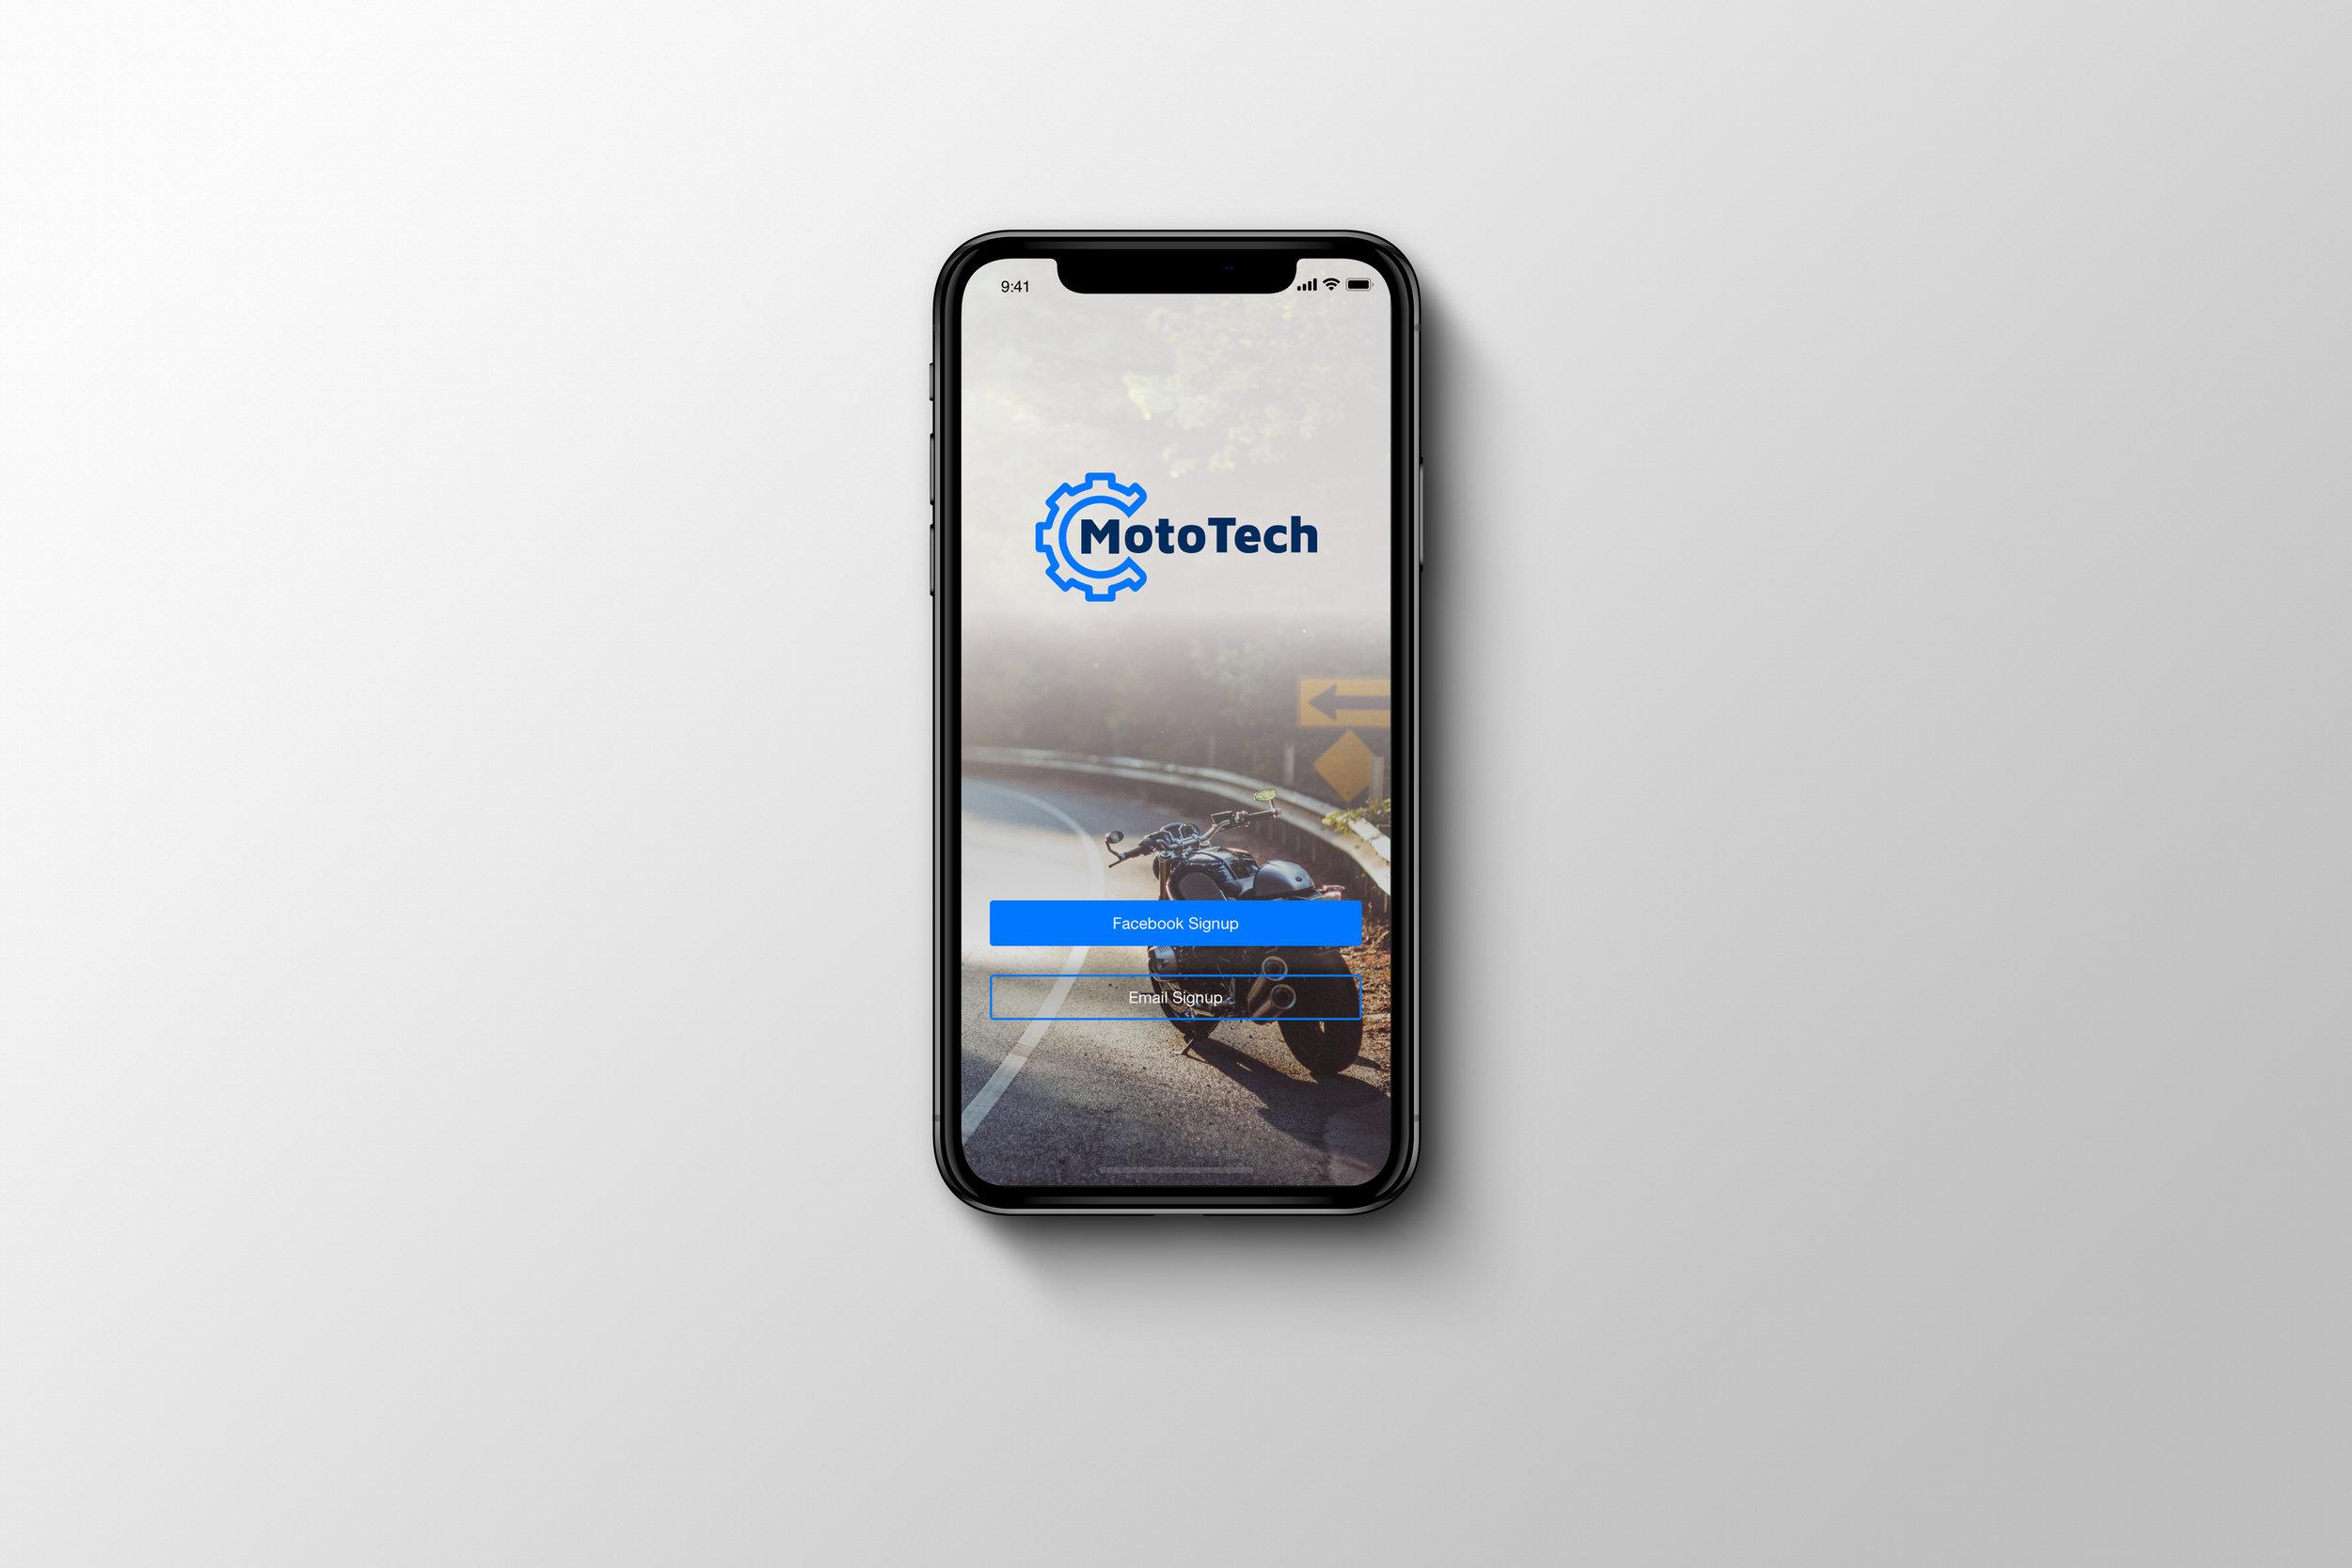 MotoTech - (Motorcycle Maintenance App)